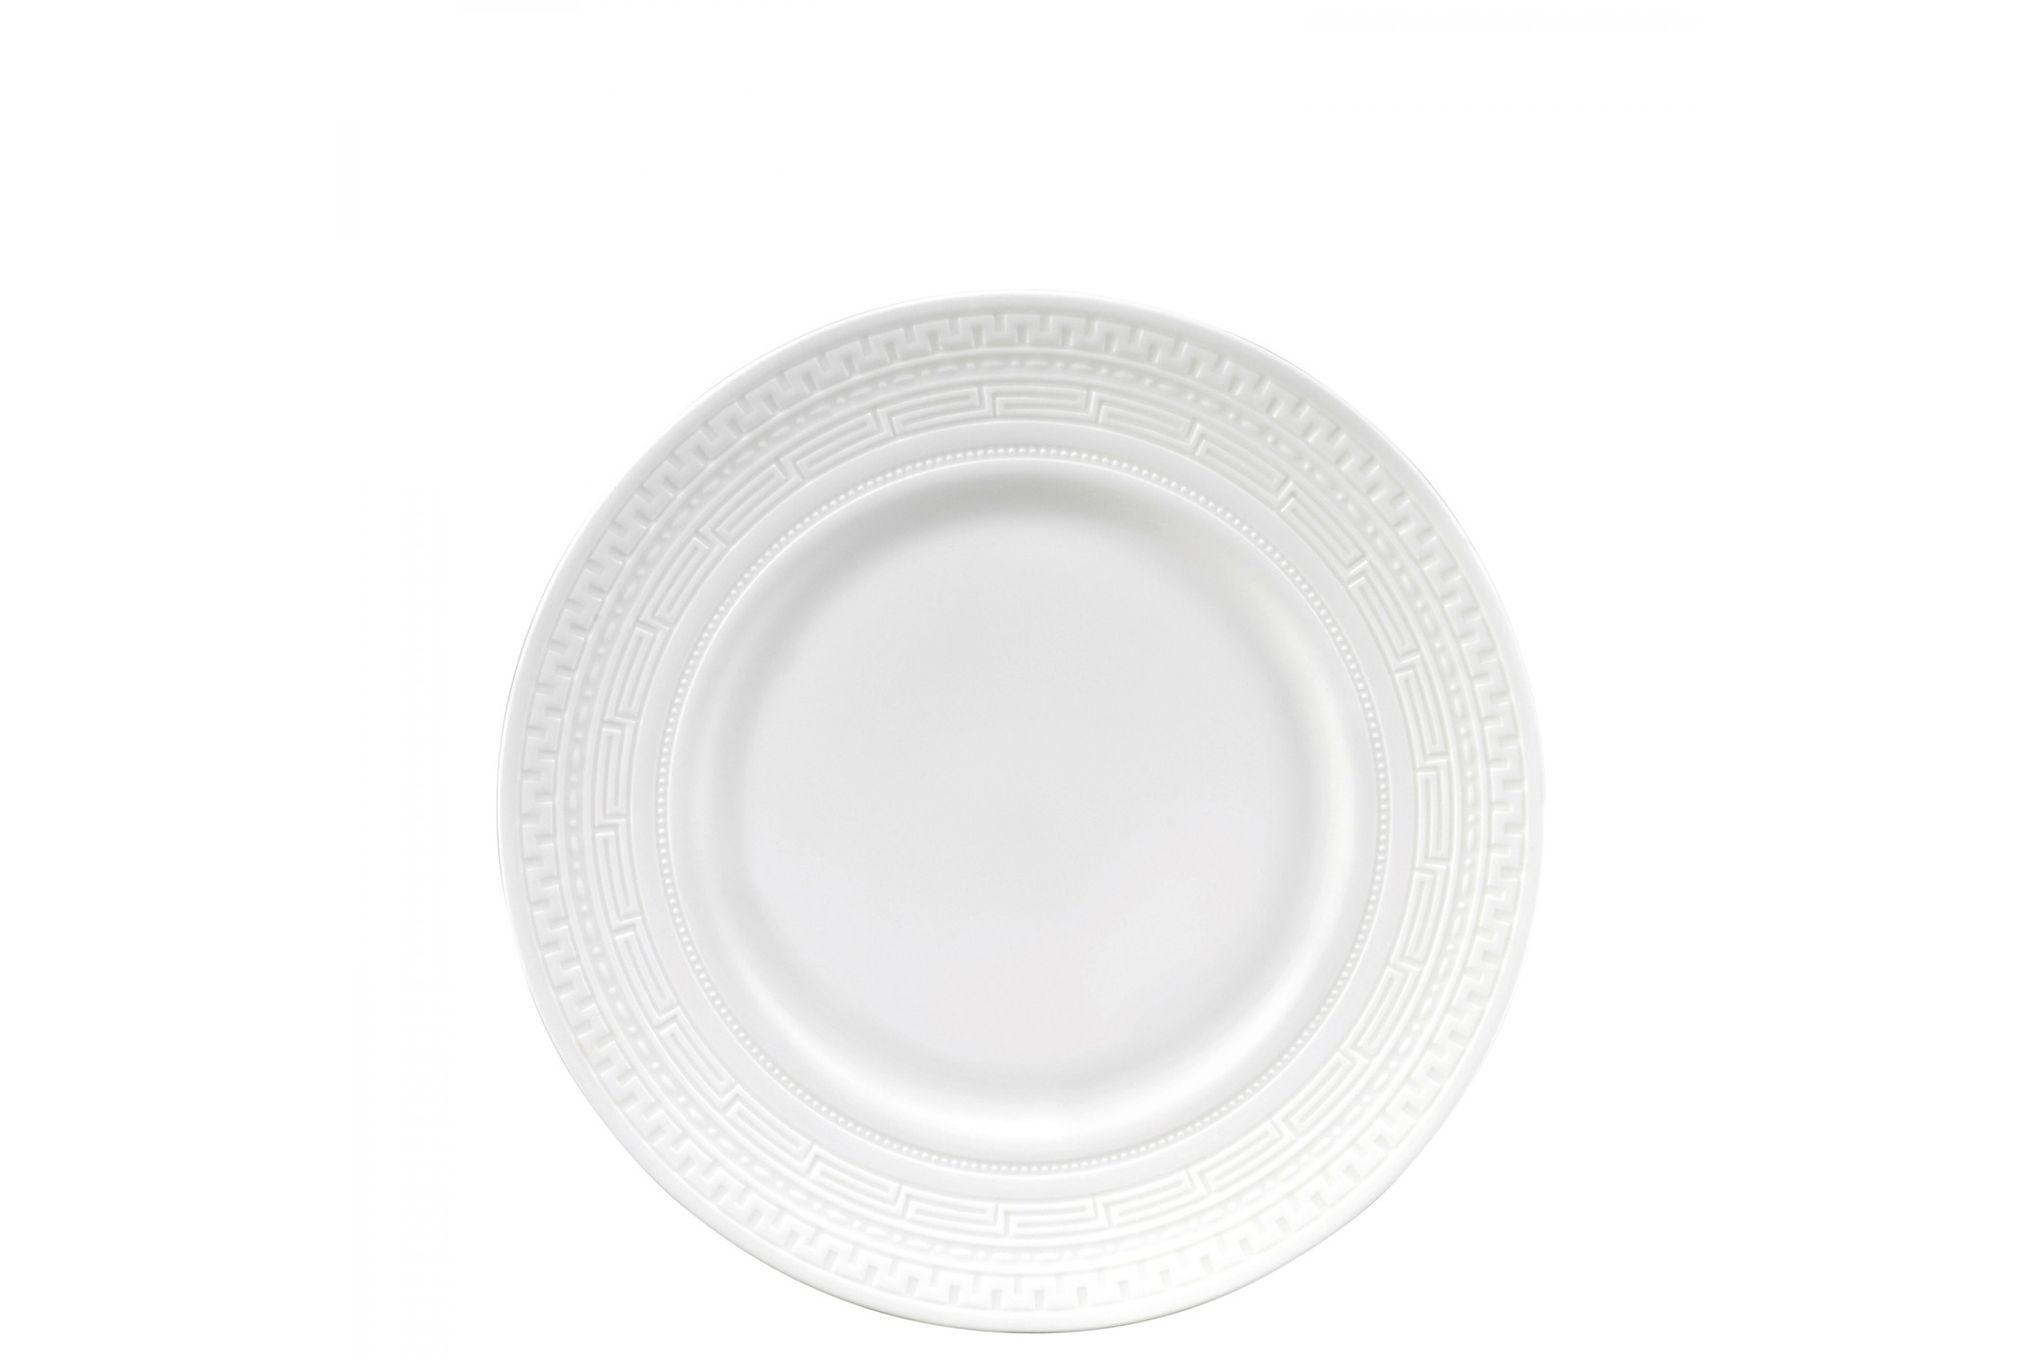 Wedgwood Intaglio Breakfast / Salad / Luncheon Plate 23cm thumb 1